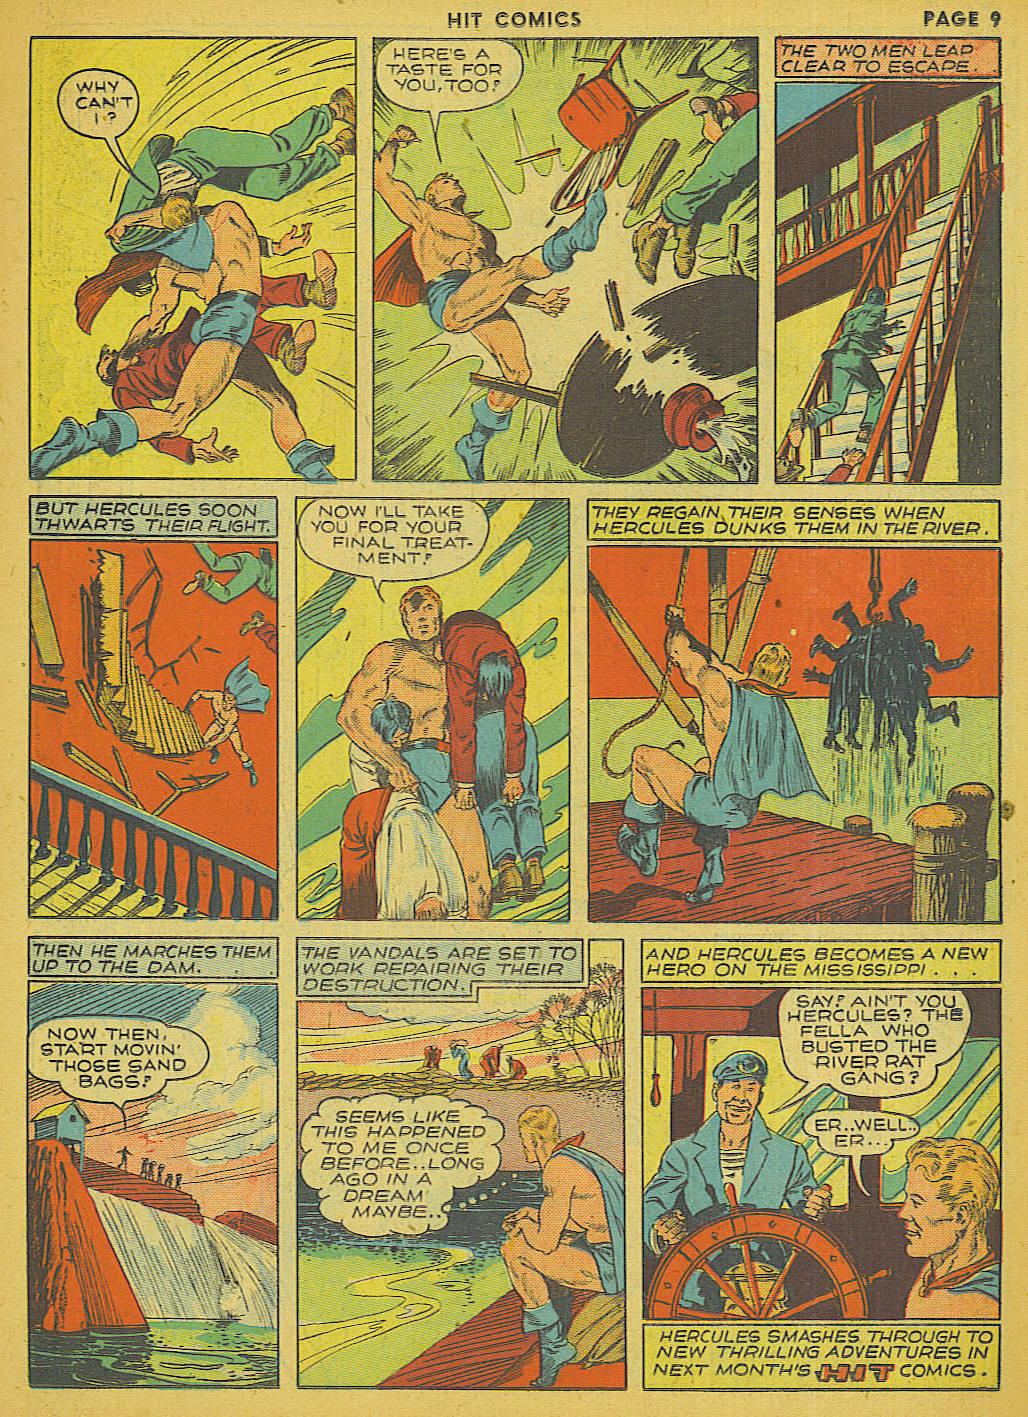 Read online Hit Comics comic -  Issue #13 - 11